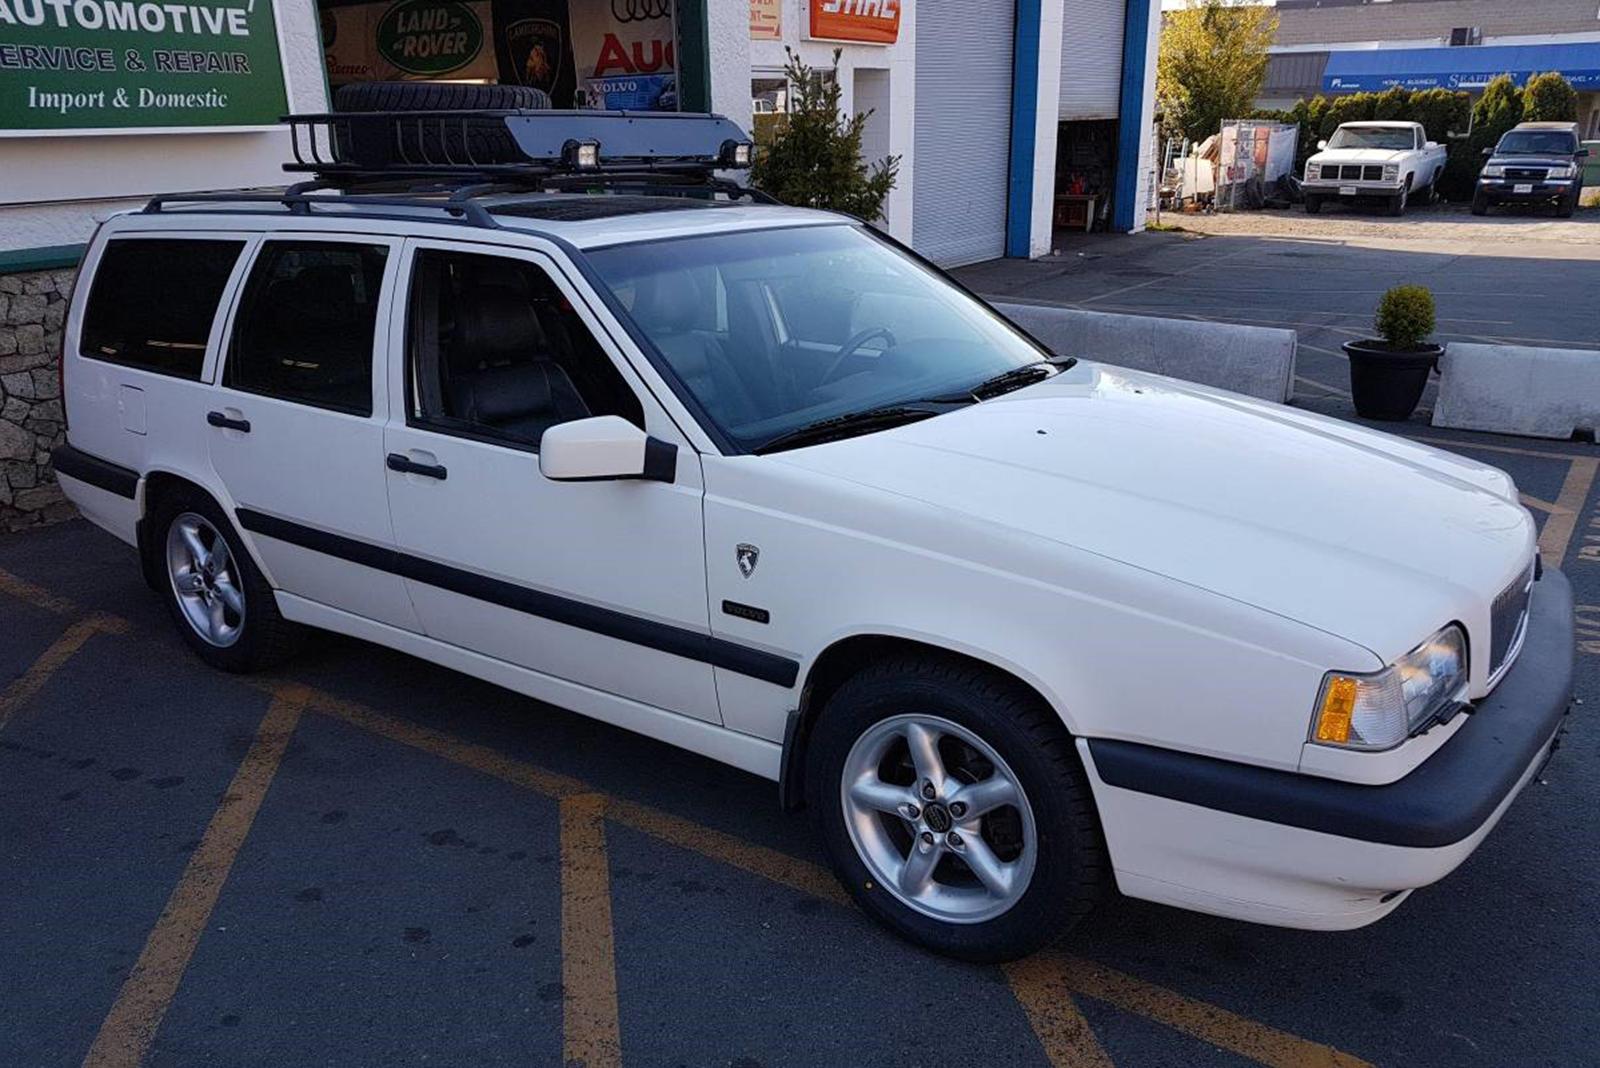 1998 Toyota Supra Twin Turbo For Sale Craigslist ✓ The